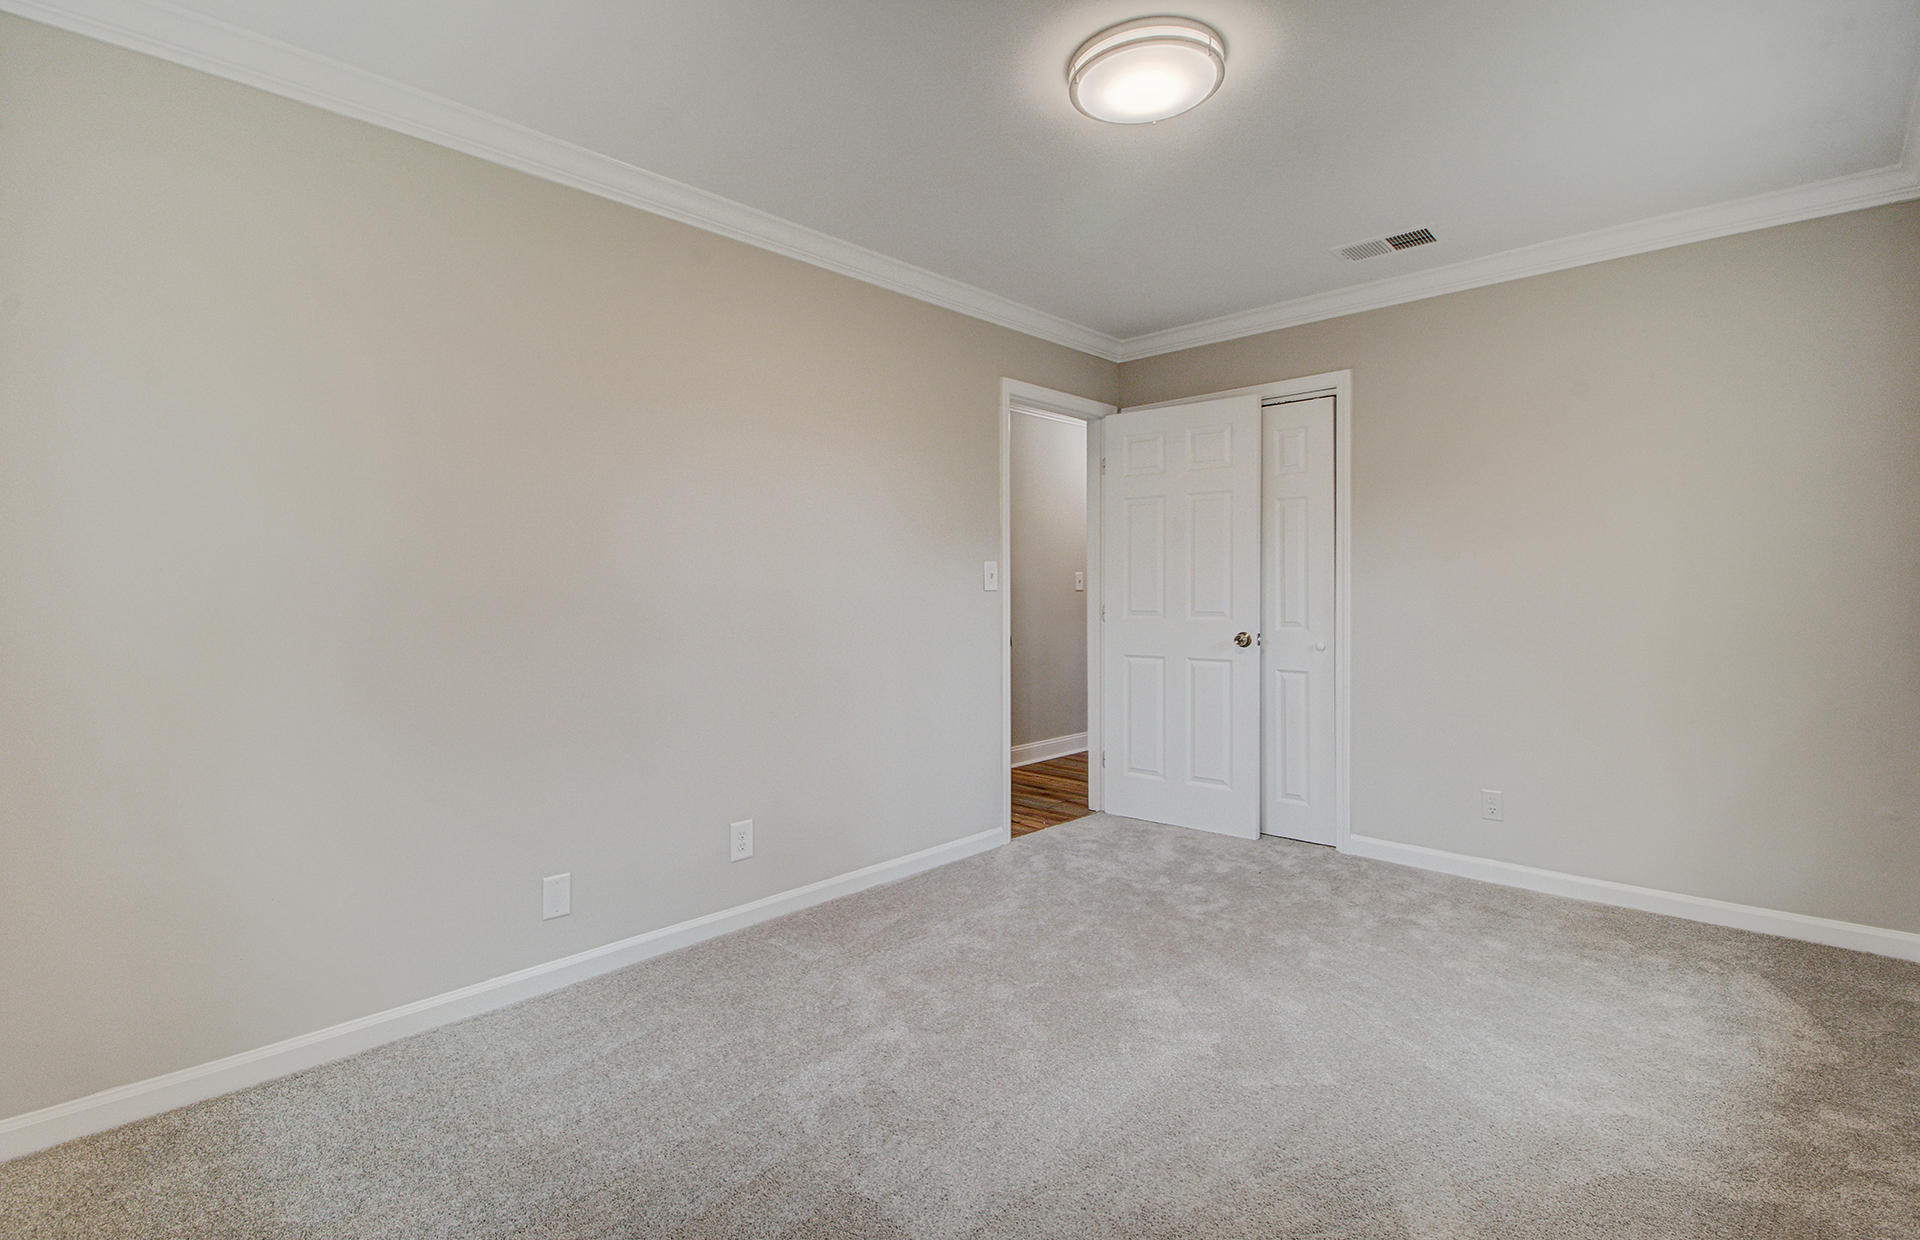 Sedgefield Section I Homes For Sale - 30 Aldene, Goose Creek, SC - 5